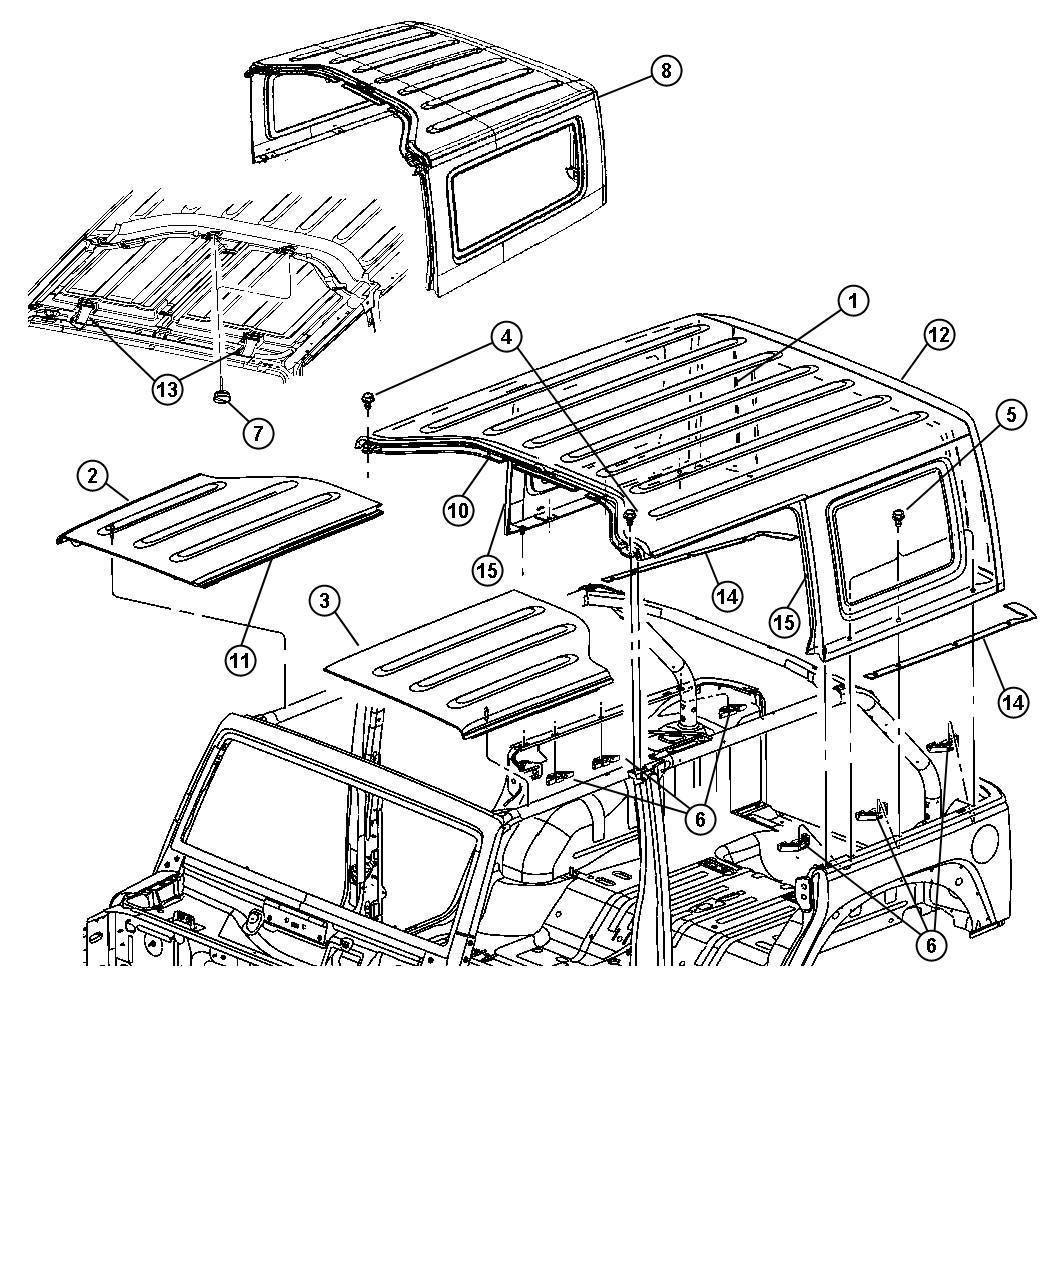 2007 Jeep Wrangler Pin. Locator. Use up to 11-26-07, use